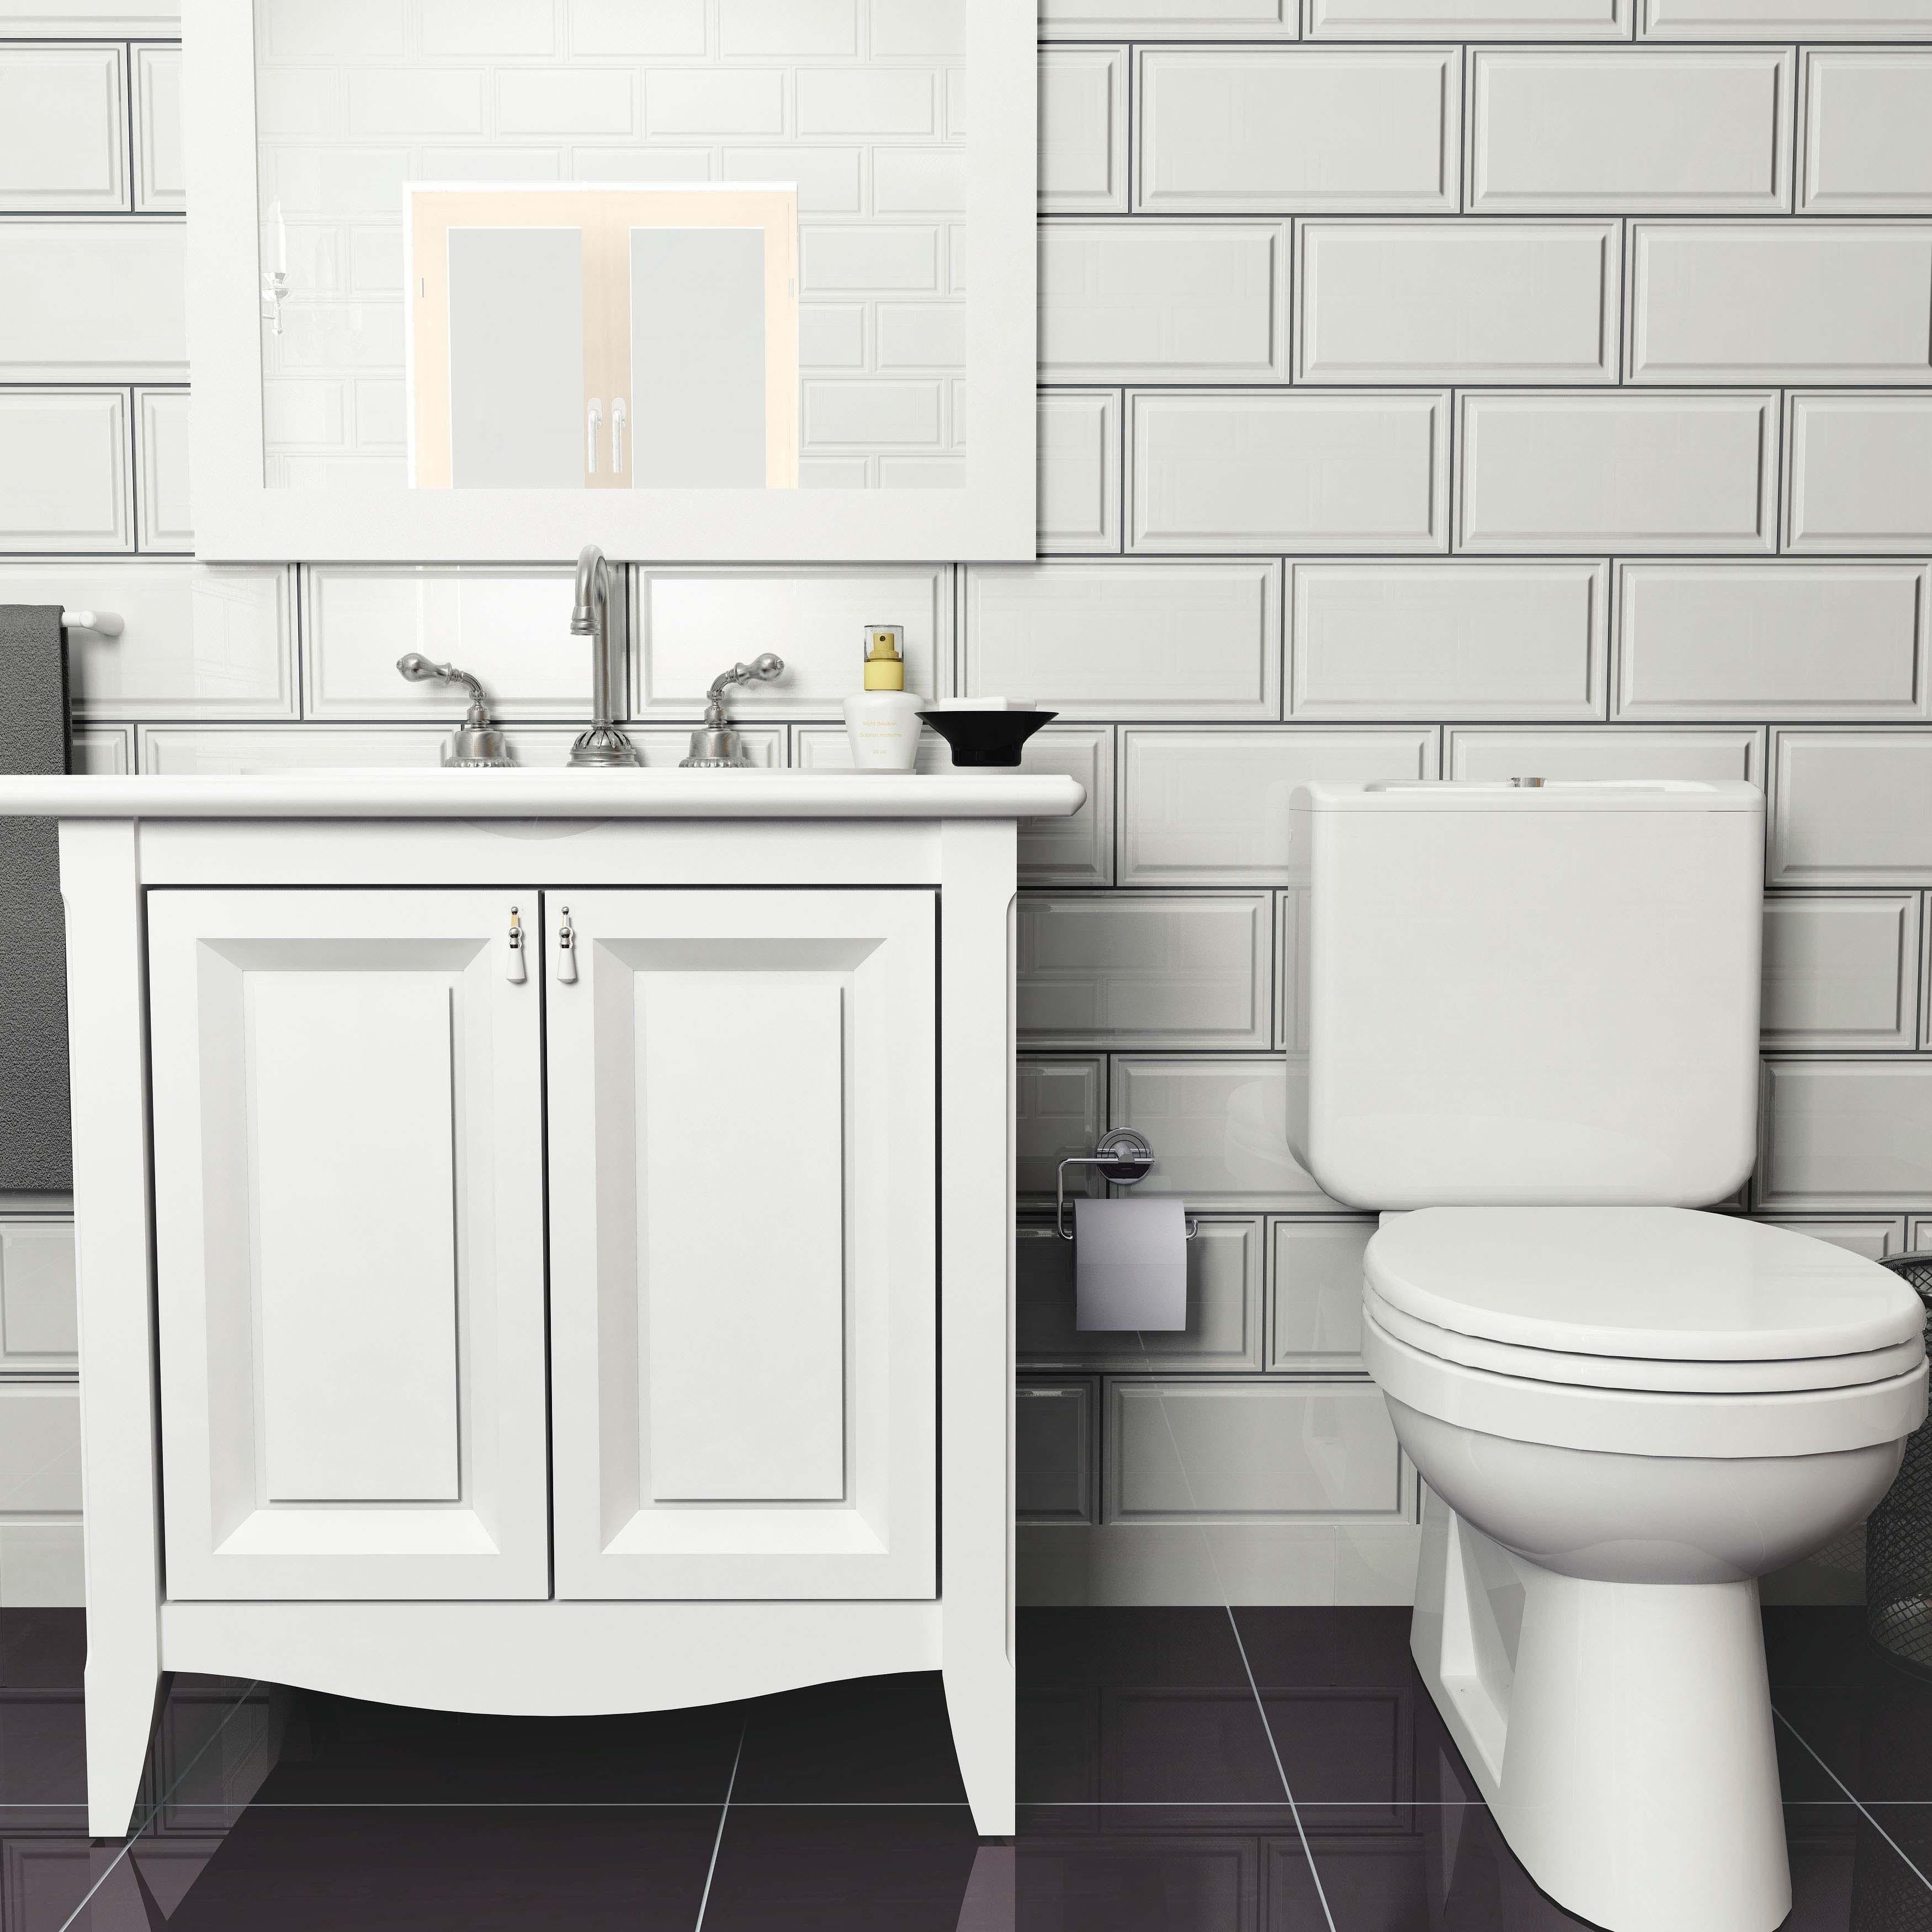 Somertile 6x12 Inch Dobladillo White Ceramic Wall Tile 22 Tiles 10 76 Sqft Free Shipping Today 18037114